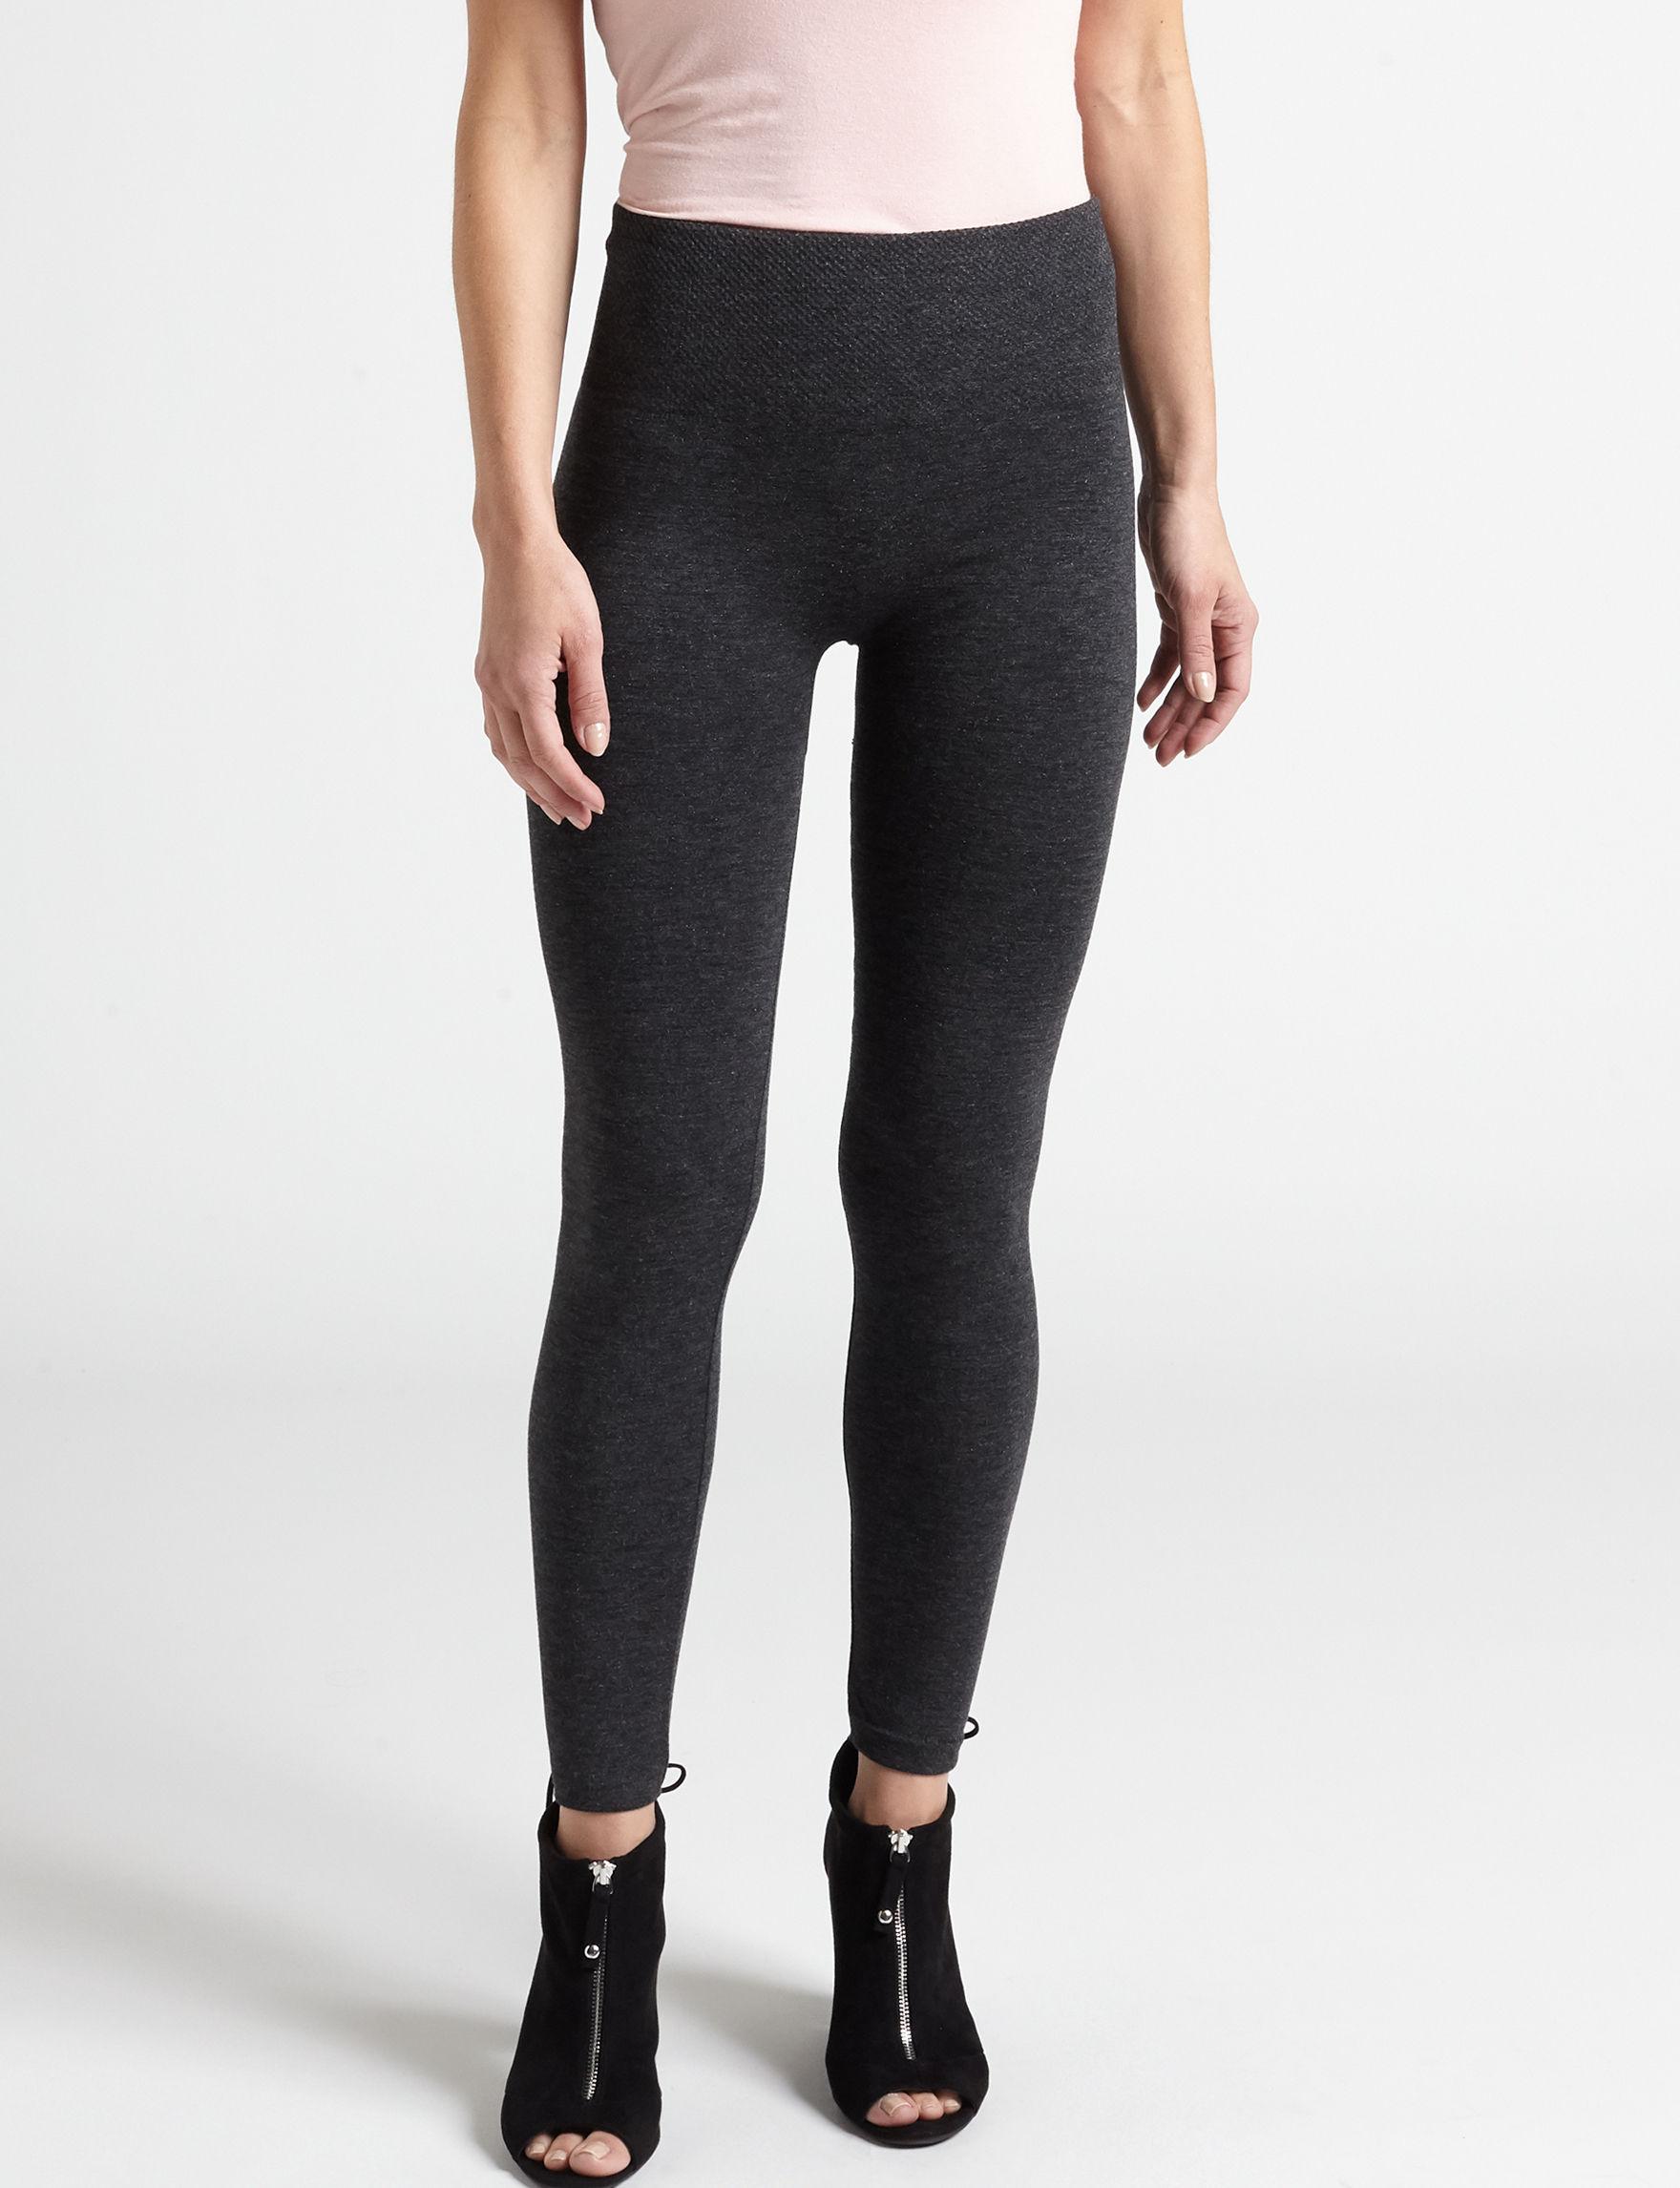 One 5 One Grey Leggings